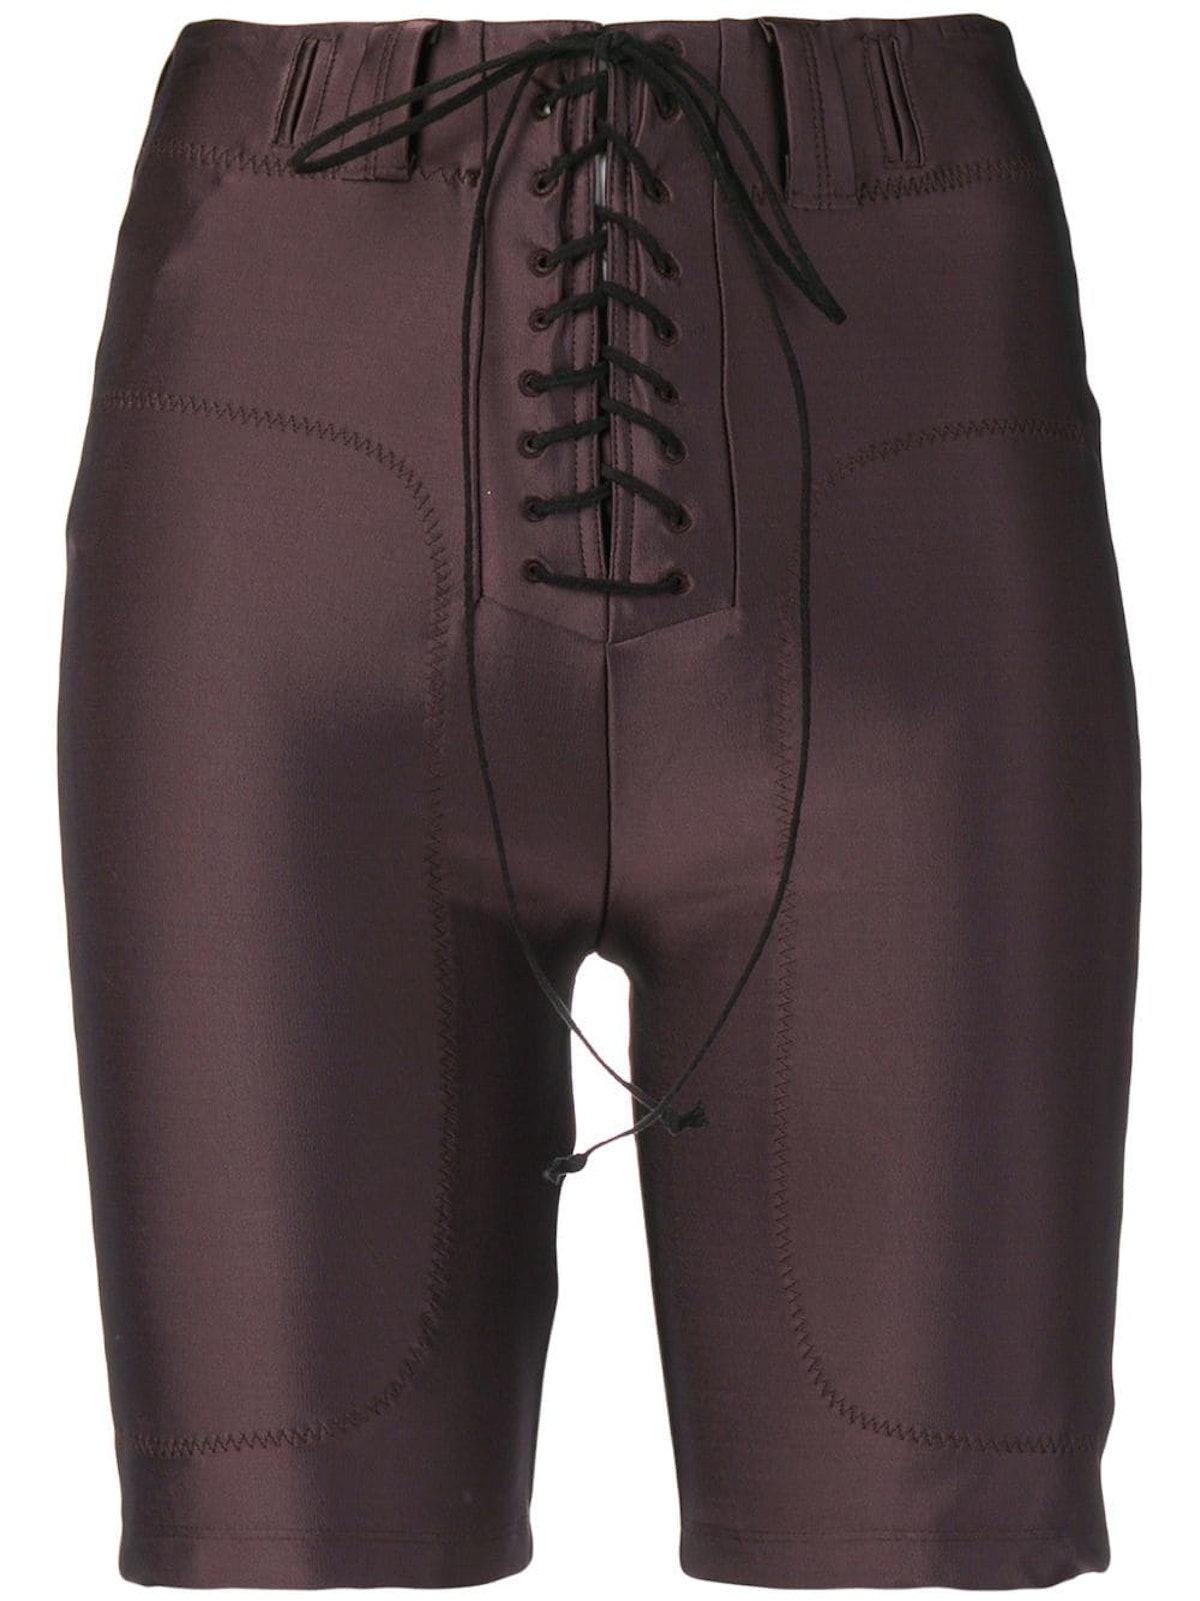 Lace-Up Cycling Shorts